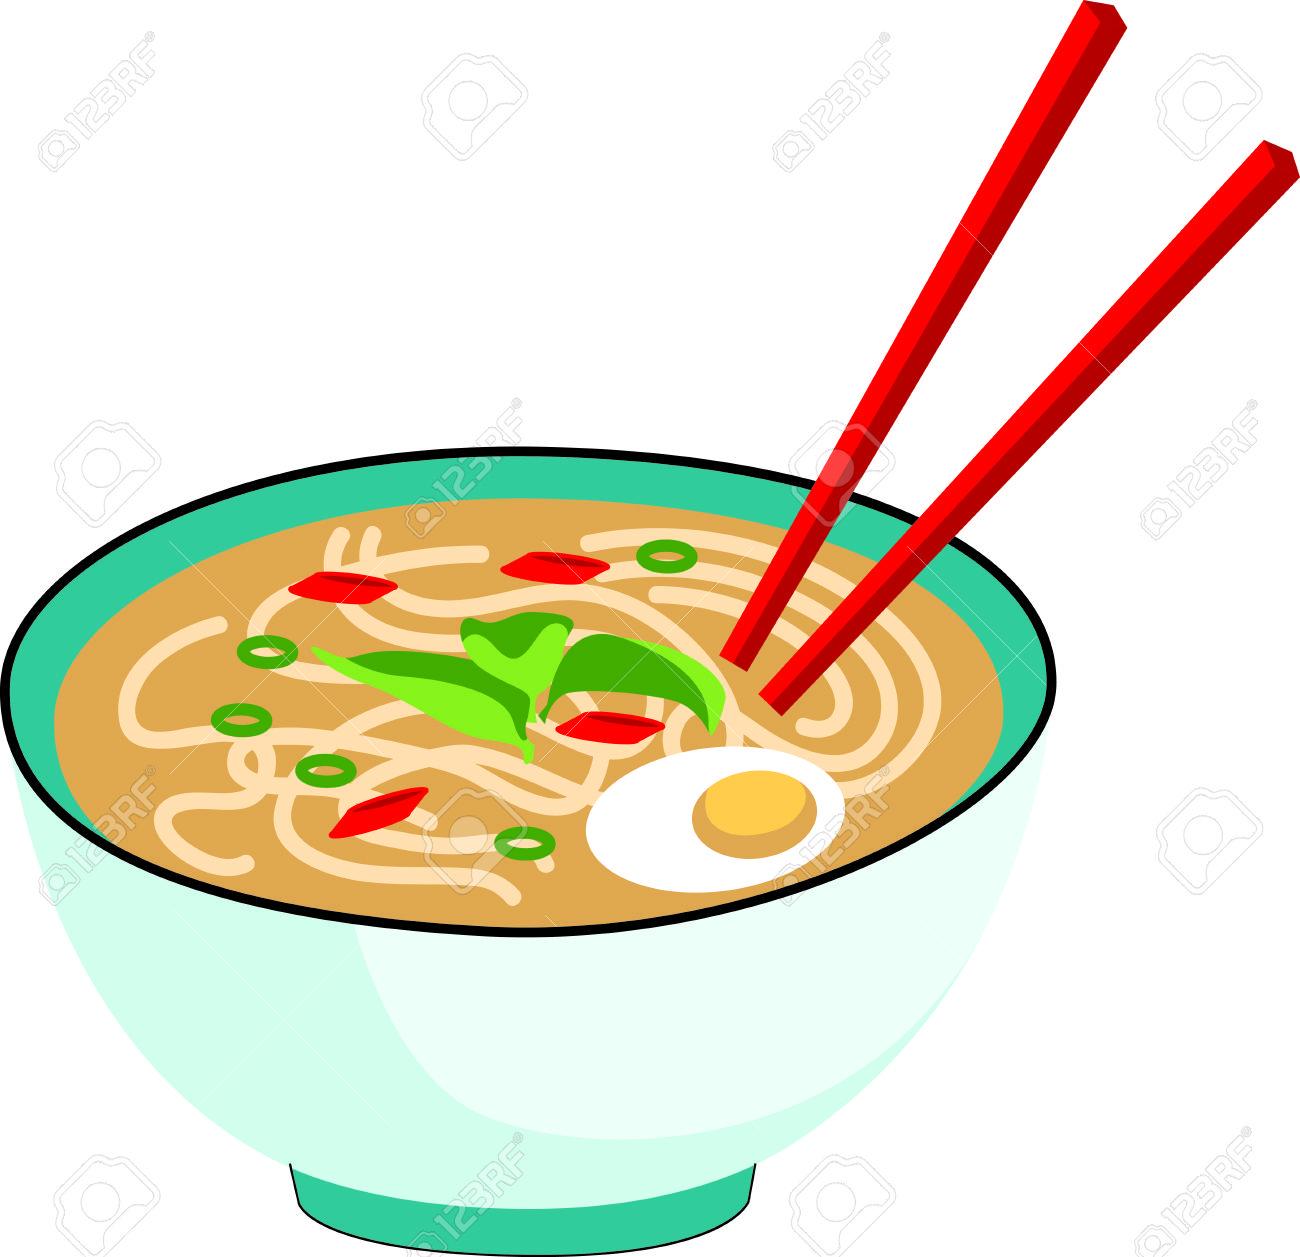 Noodles Cliparts | Free download best Noodles Cliparts on ...